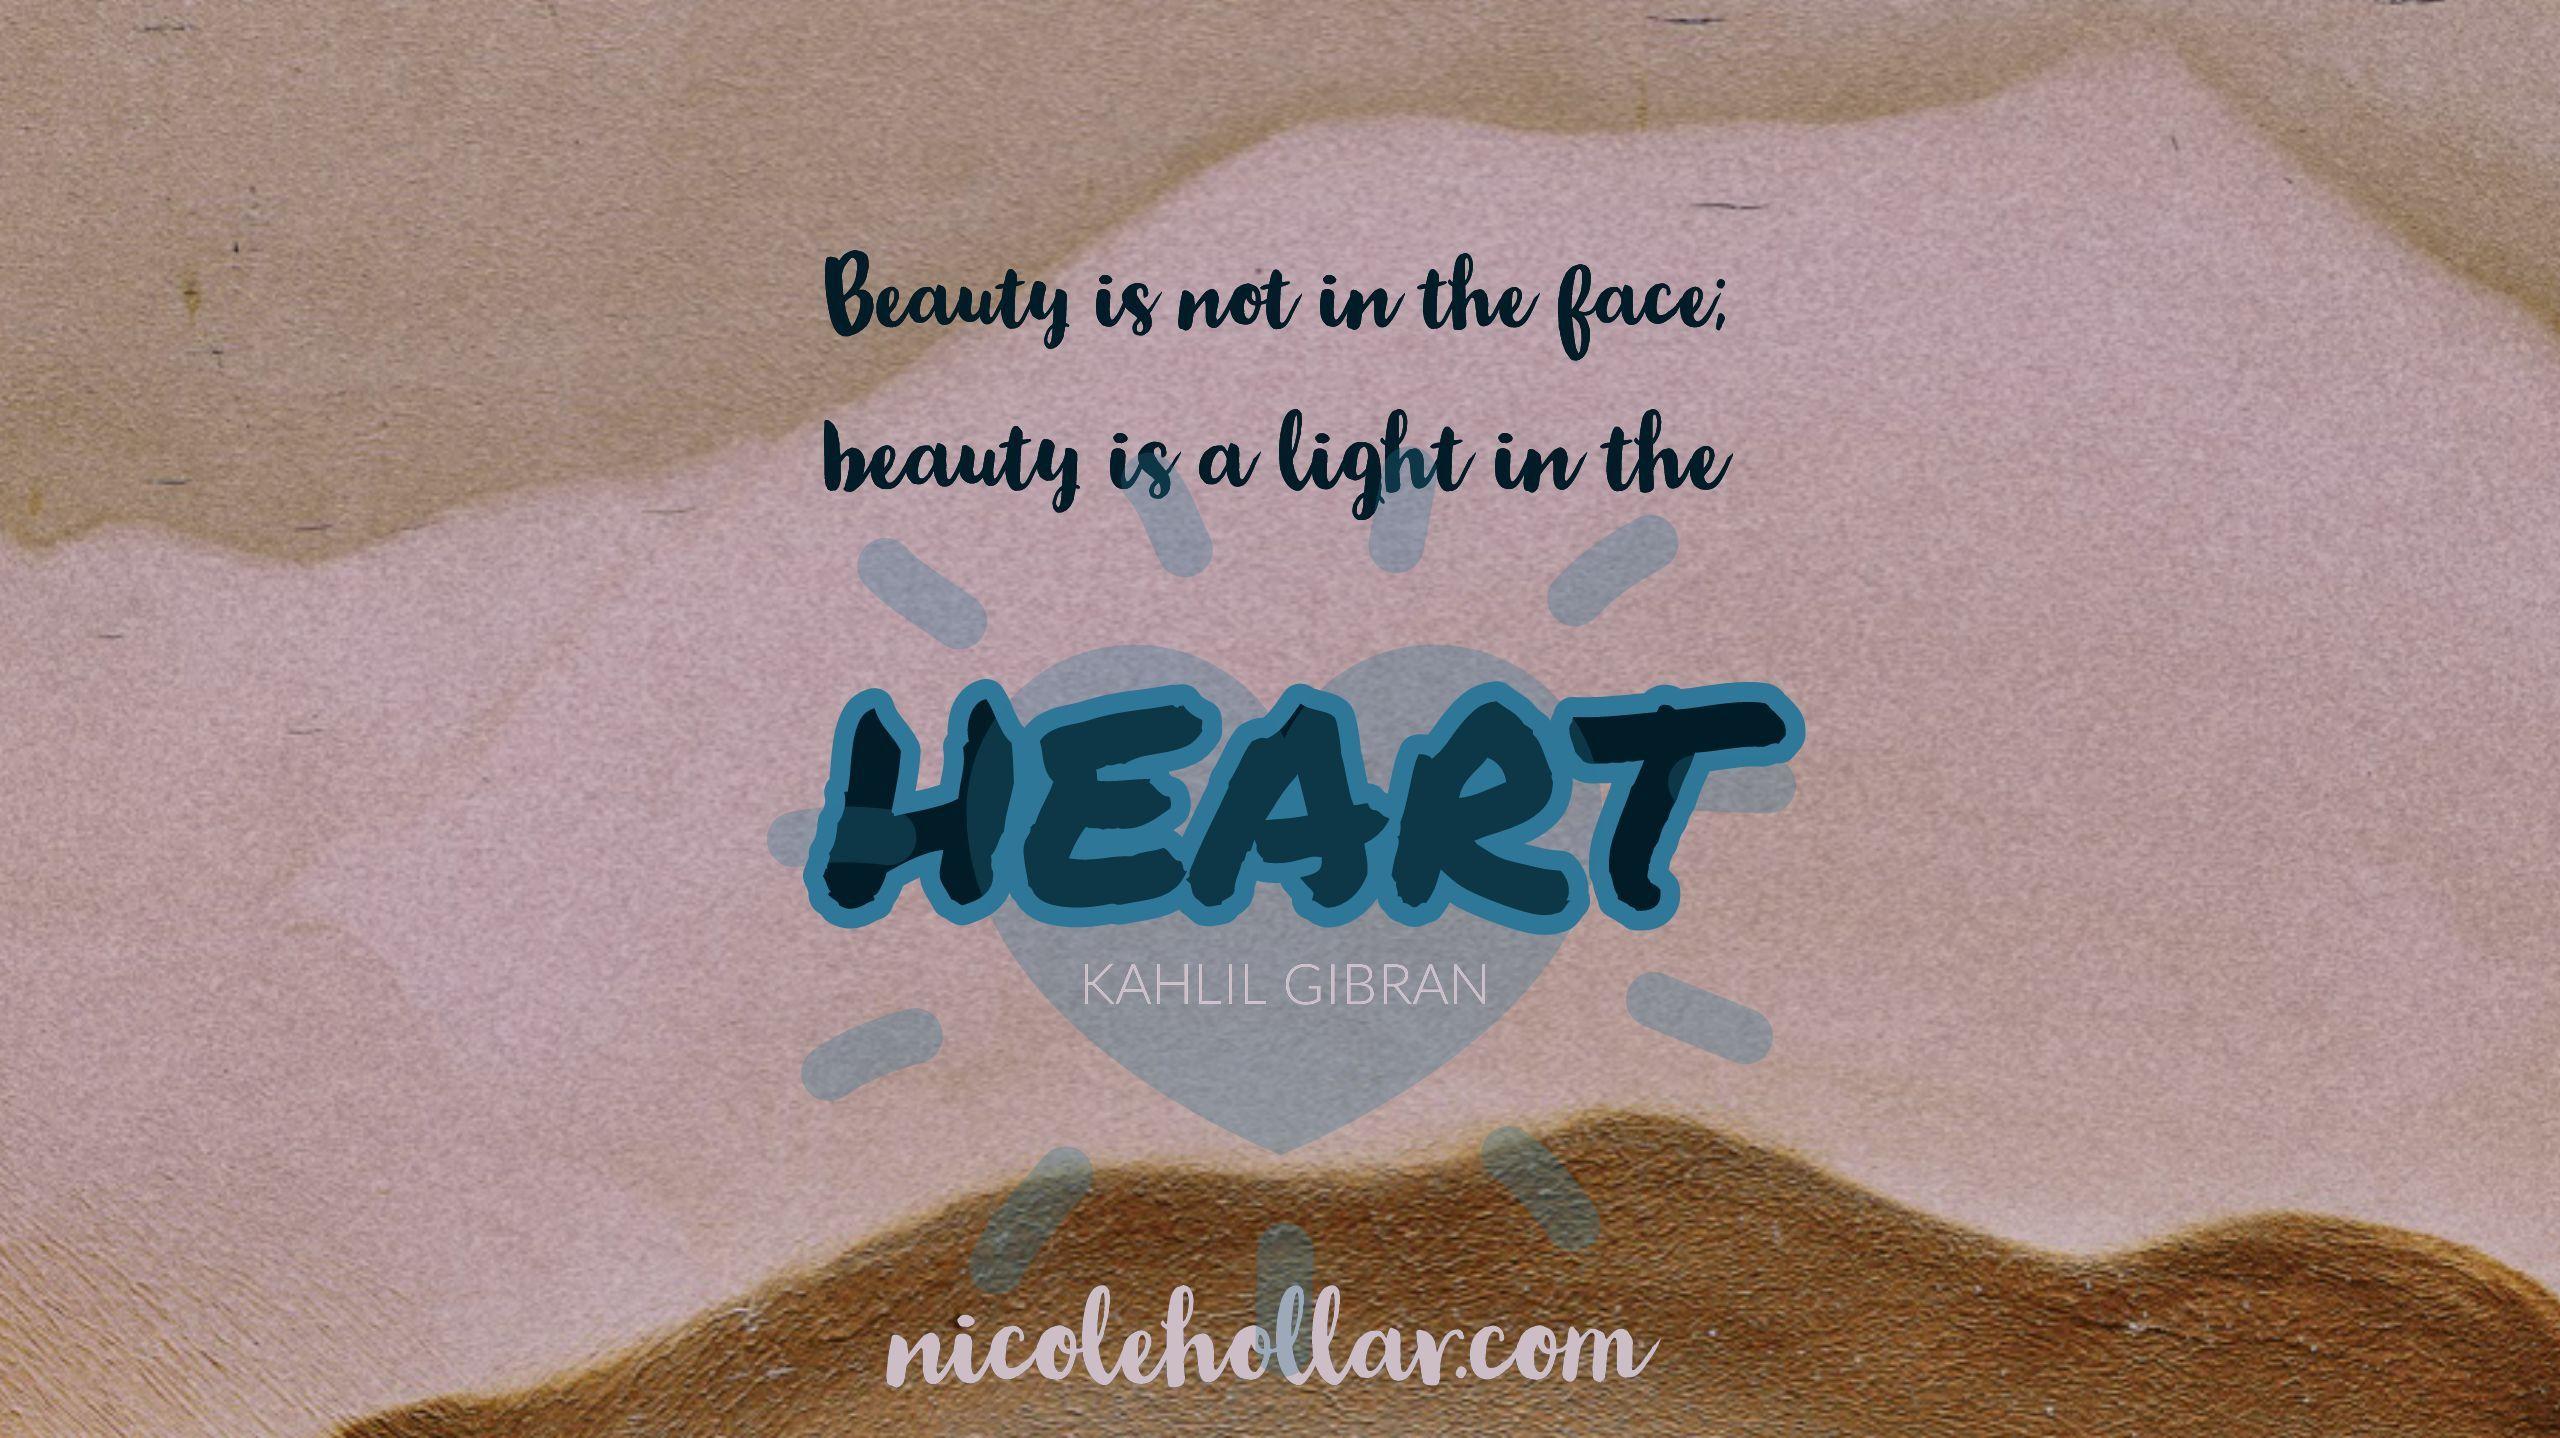 Beauty Is Not In The Face It Is A Light In The Heart Beauty